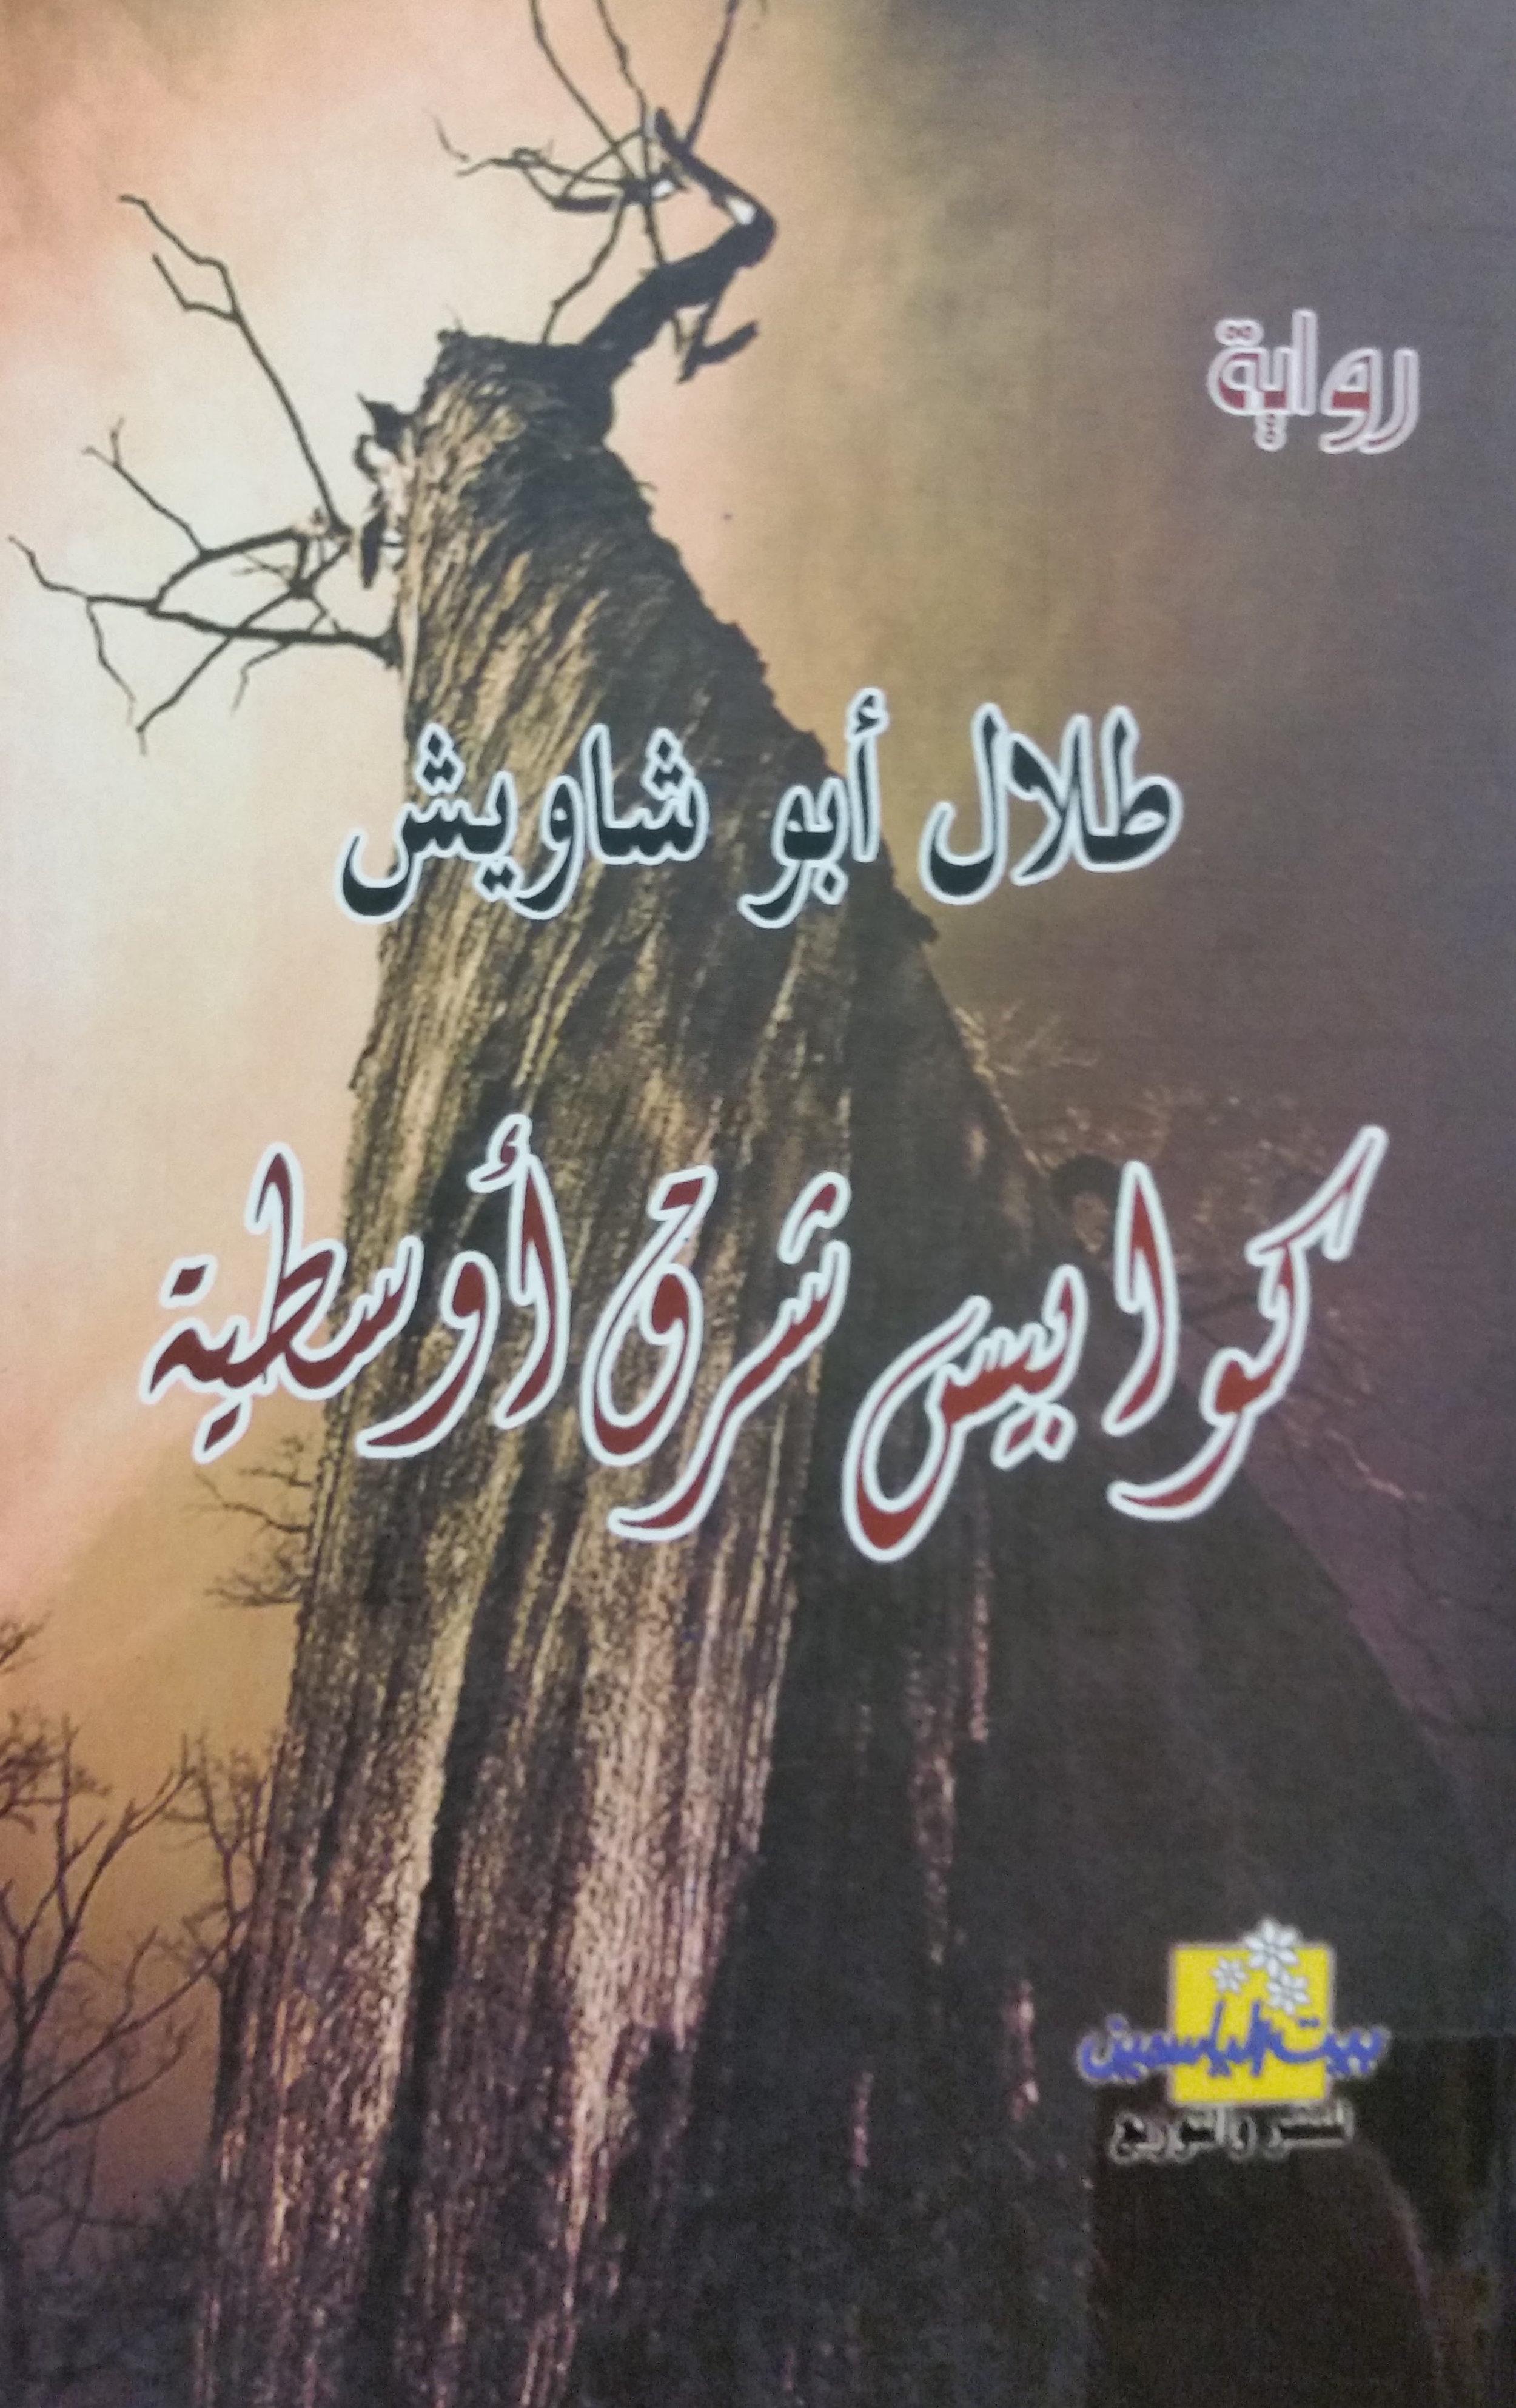 Ṭalāl Abū Shāwīsh, Kawābīs sharq awsaṭiyyah  (ʻĀbidīn, al-Qāhirah: Bayt al-Yāsamīn li-l-Nashr wa-l-Tawzīʻ, 2012).